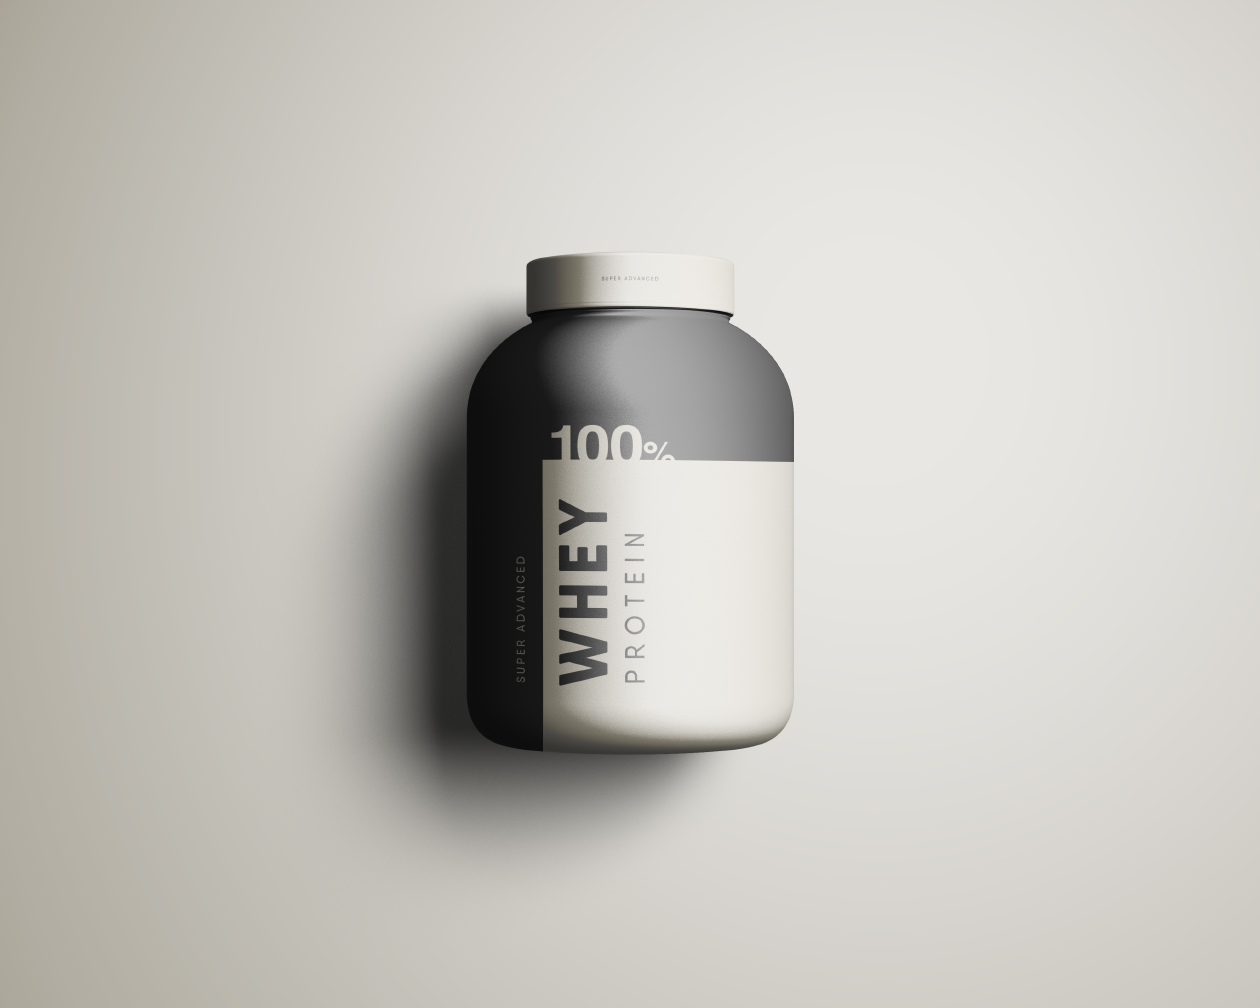 Free Whey Protein Jar Mockup